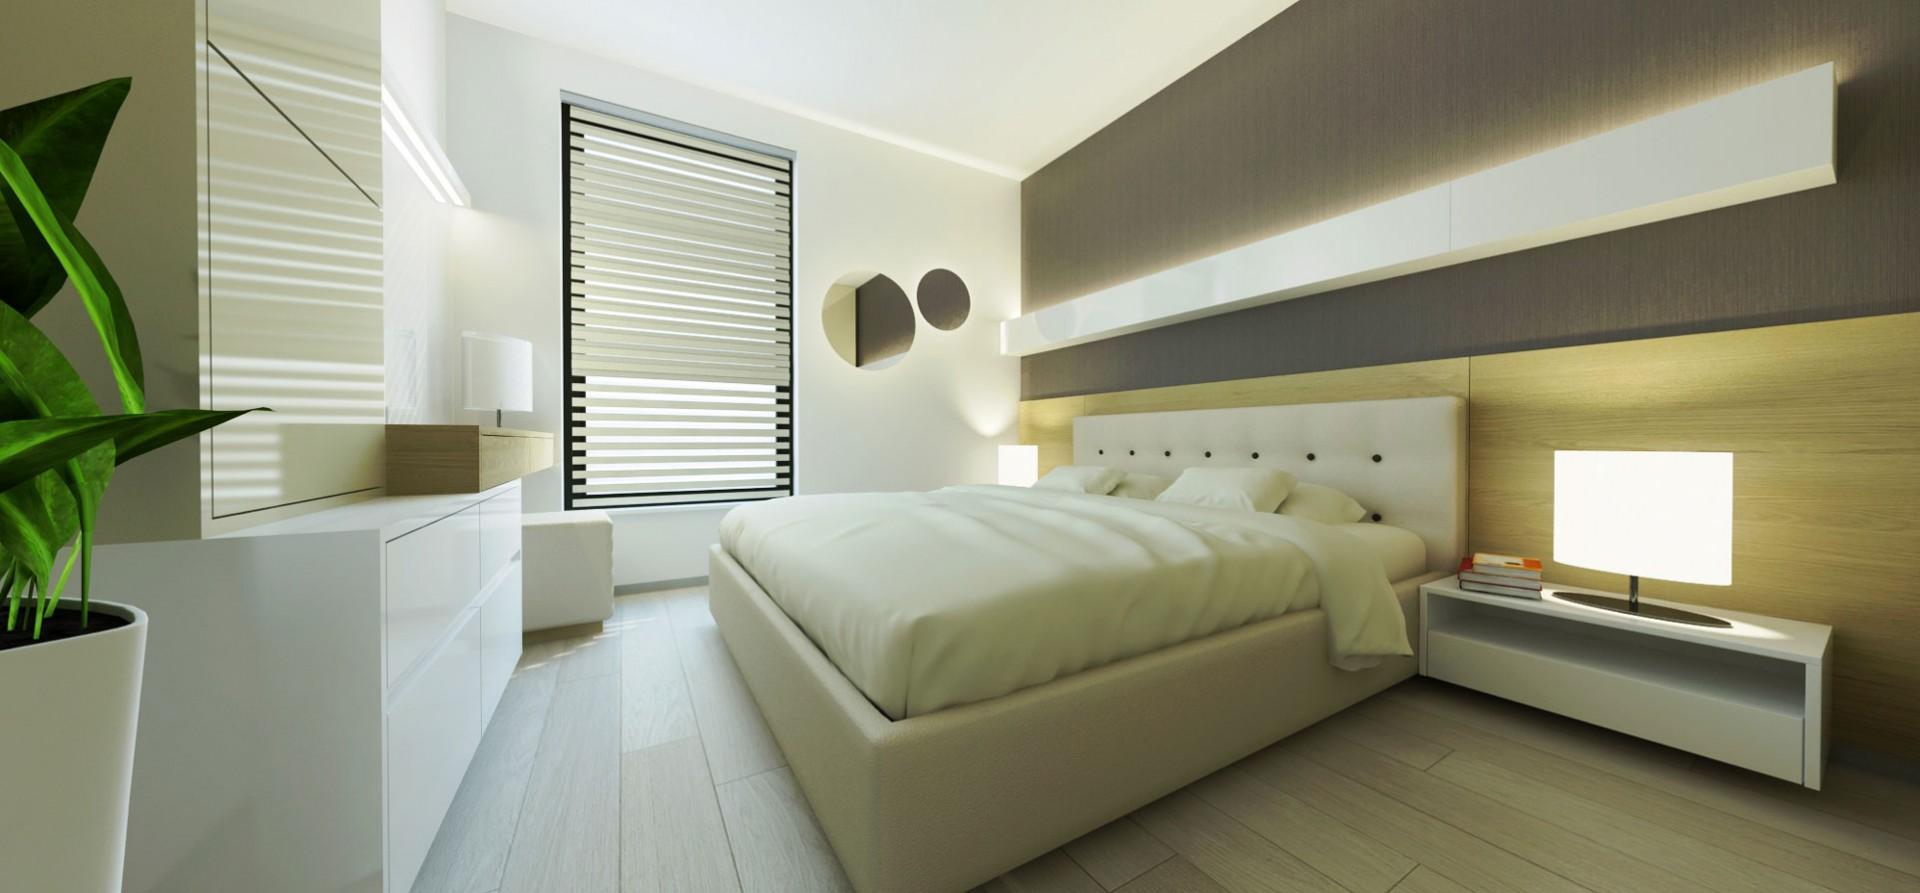 návrh interiéru rodinného domu - spálňa